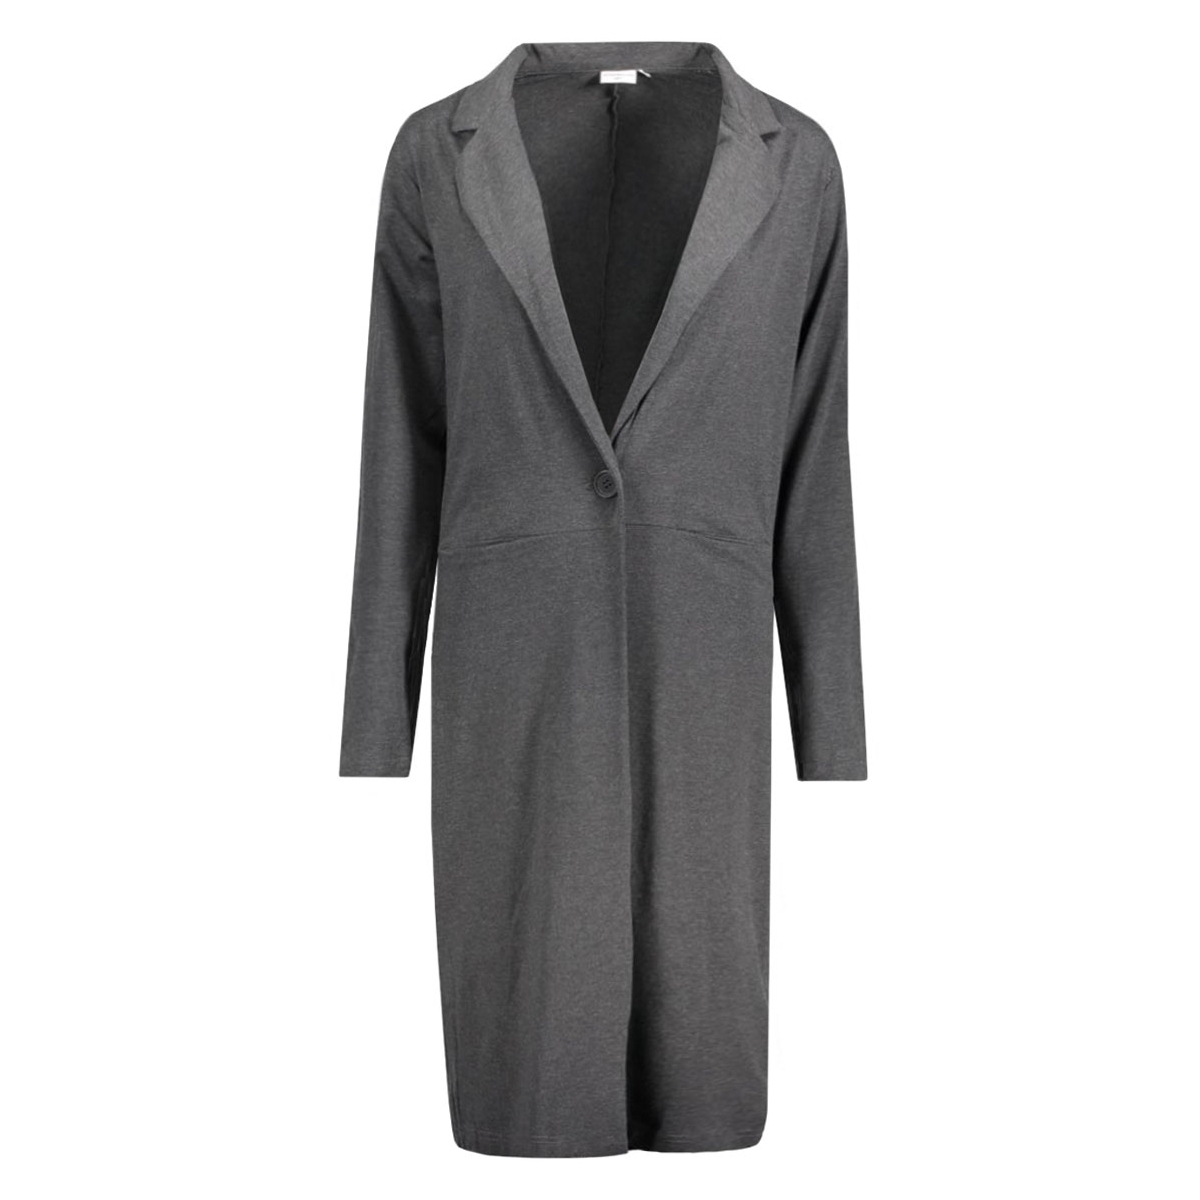 jdypruit l/s cardigan jrs 15120270 jacqueline de yong vest dark grey melange